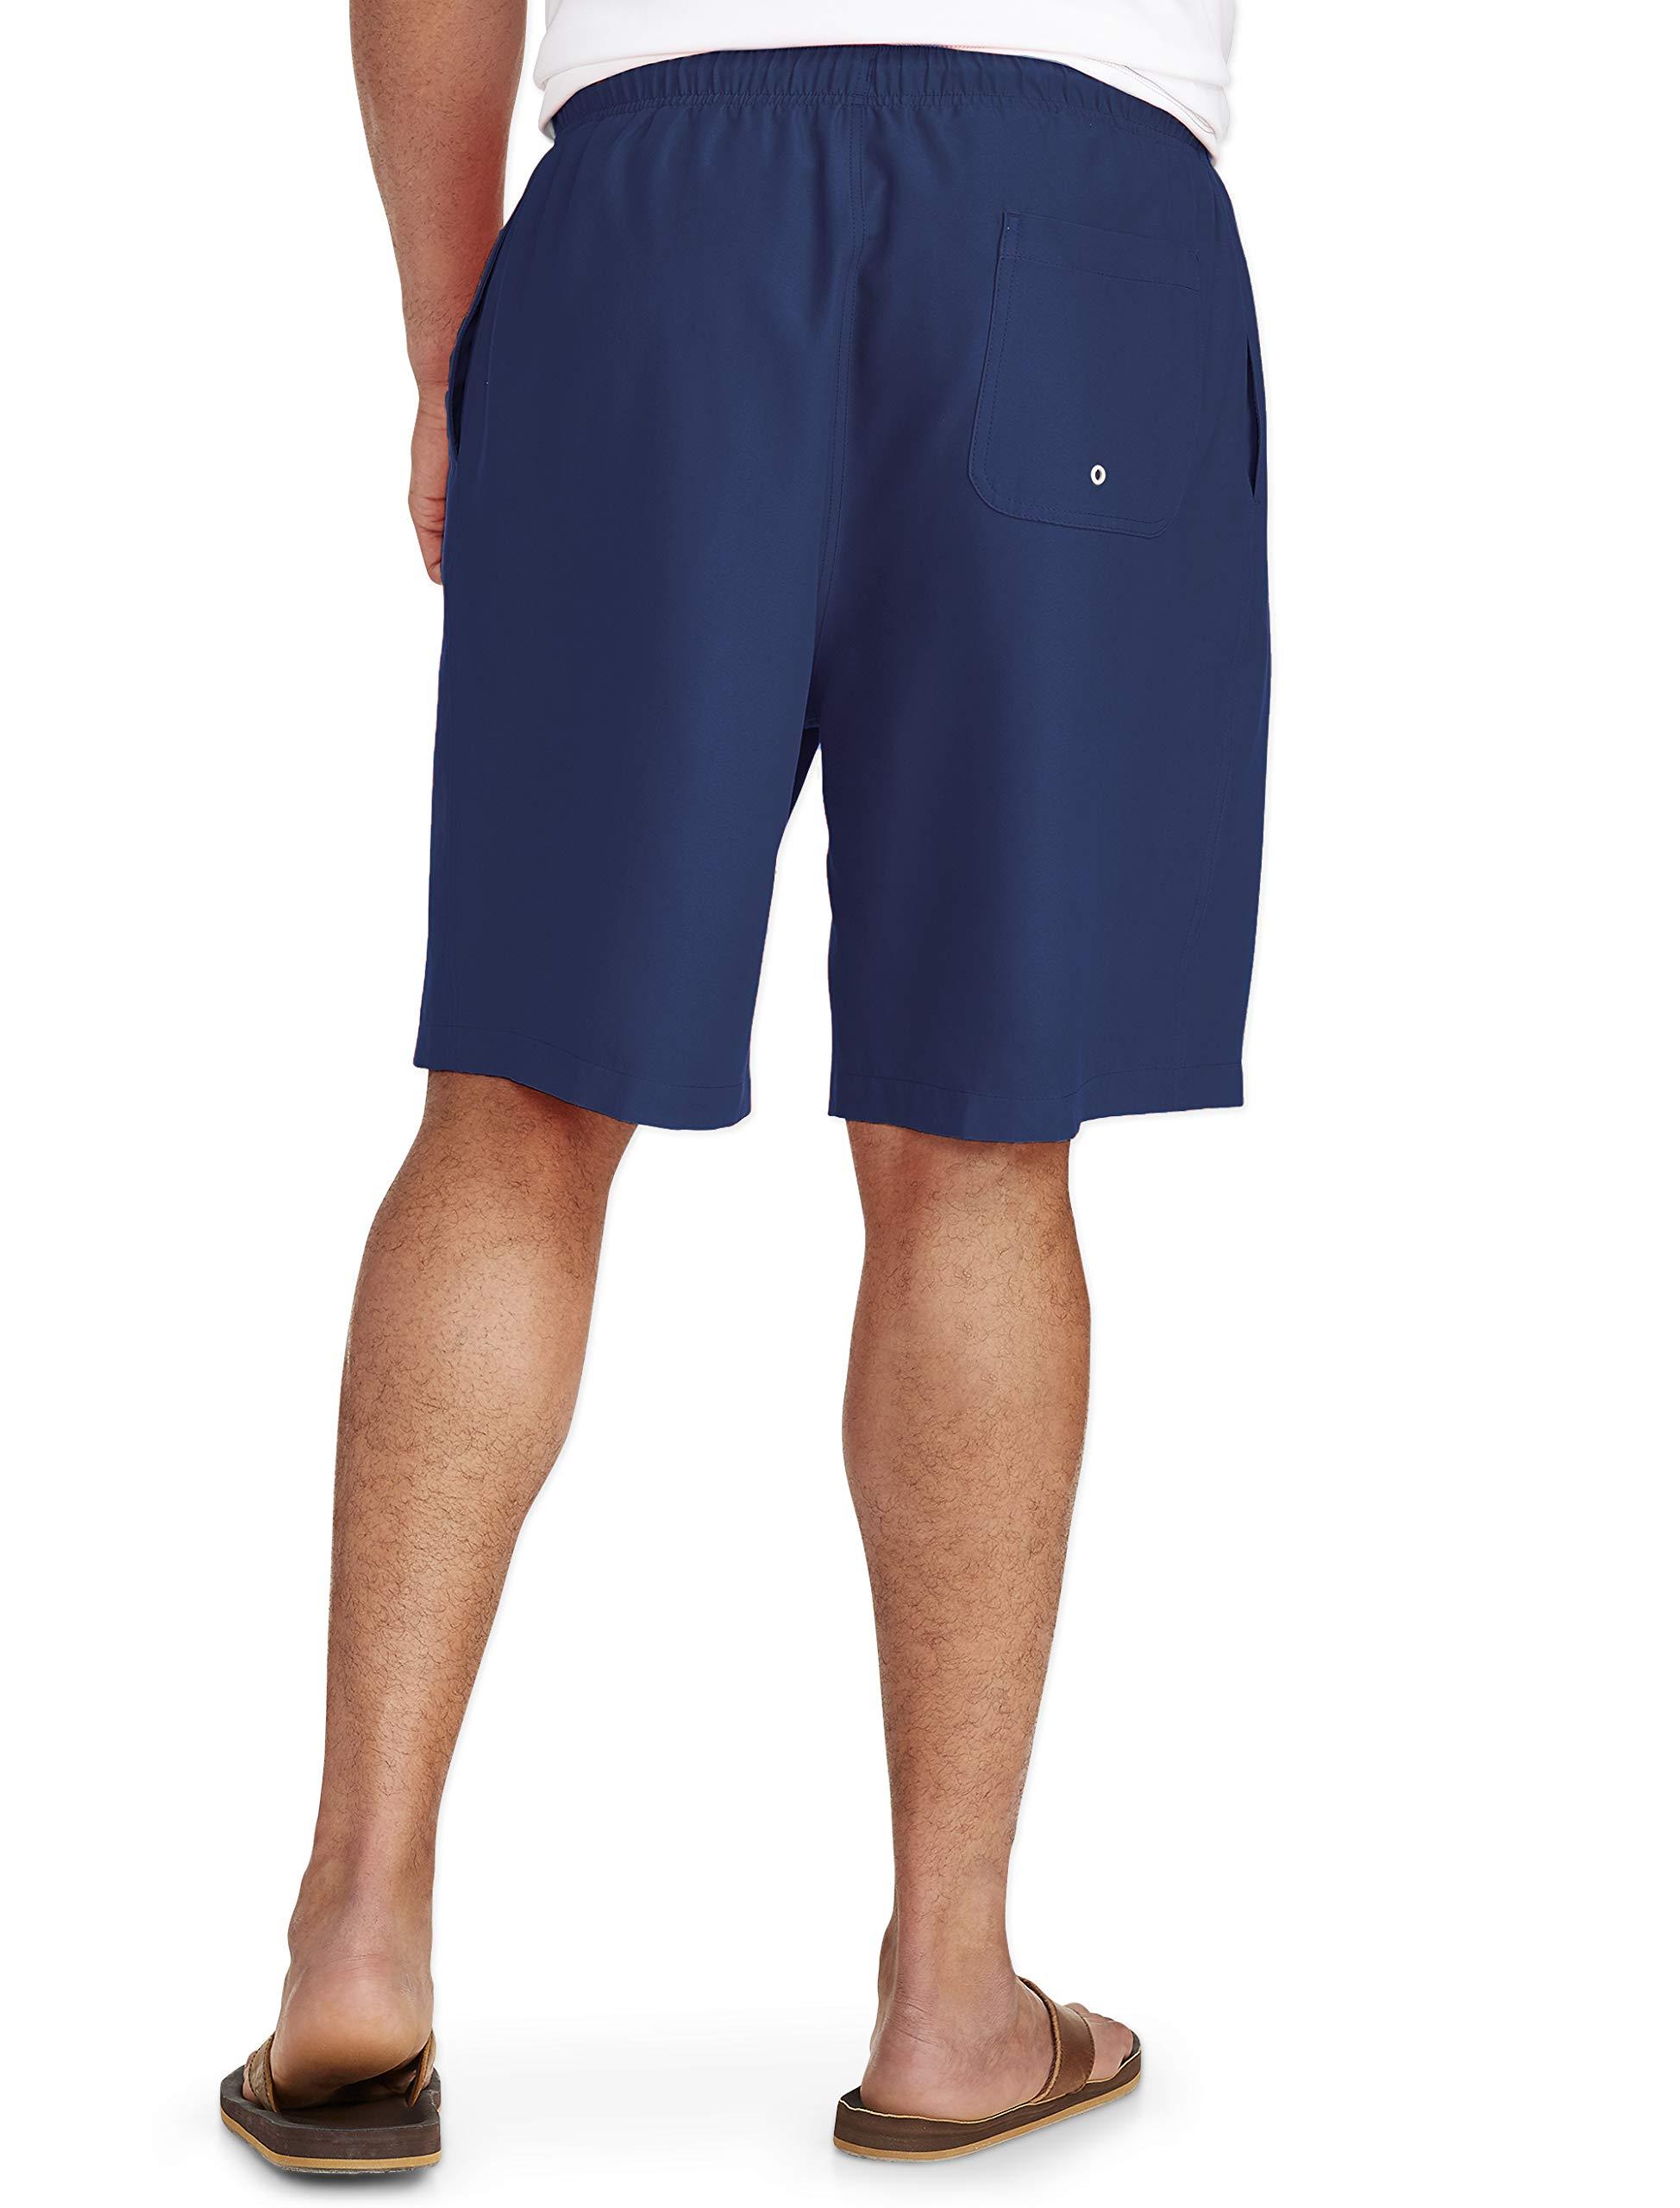 Amazon Essentials Men's Big & Tall Quick-Dry Swim Trunk fit by DXL